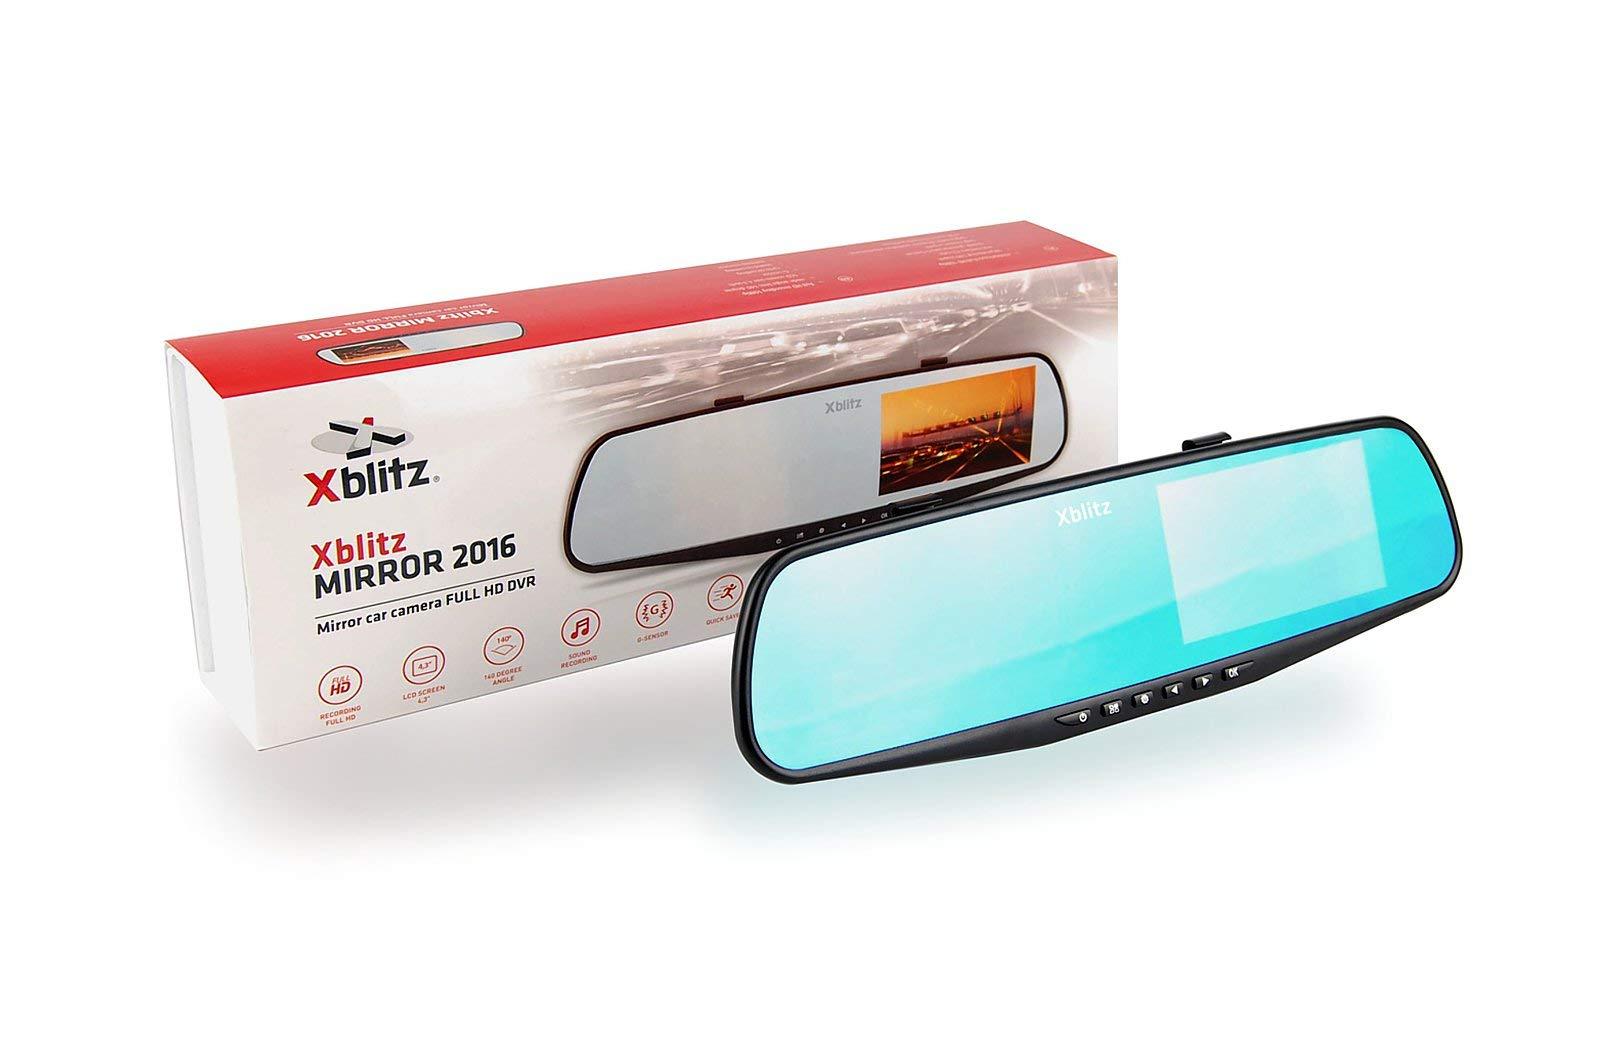 Xblitz-Mirror-2016-Autokamera-1920-X-1080p-Full-HD-4-3-Zoll-Bildschirm-G-Sensor-Eingebauter-Akku-Lautsprecher-und-Mikrofon-Bewegungsmelder-Schwarz